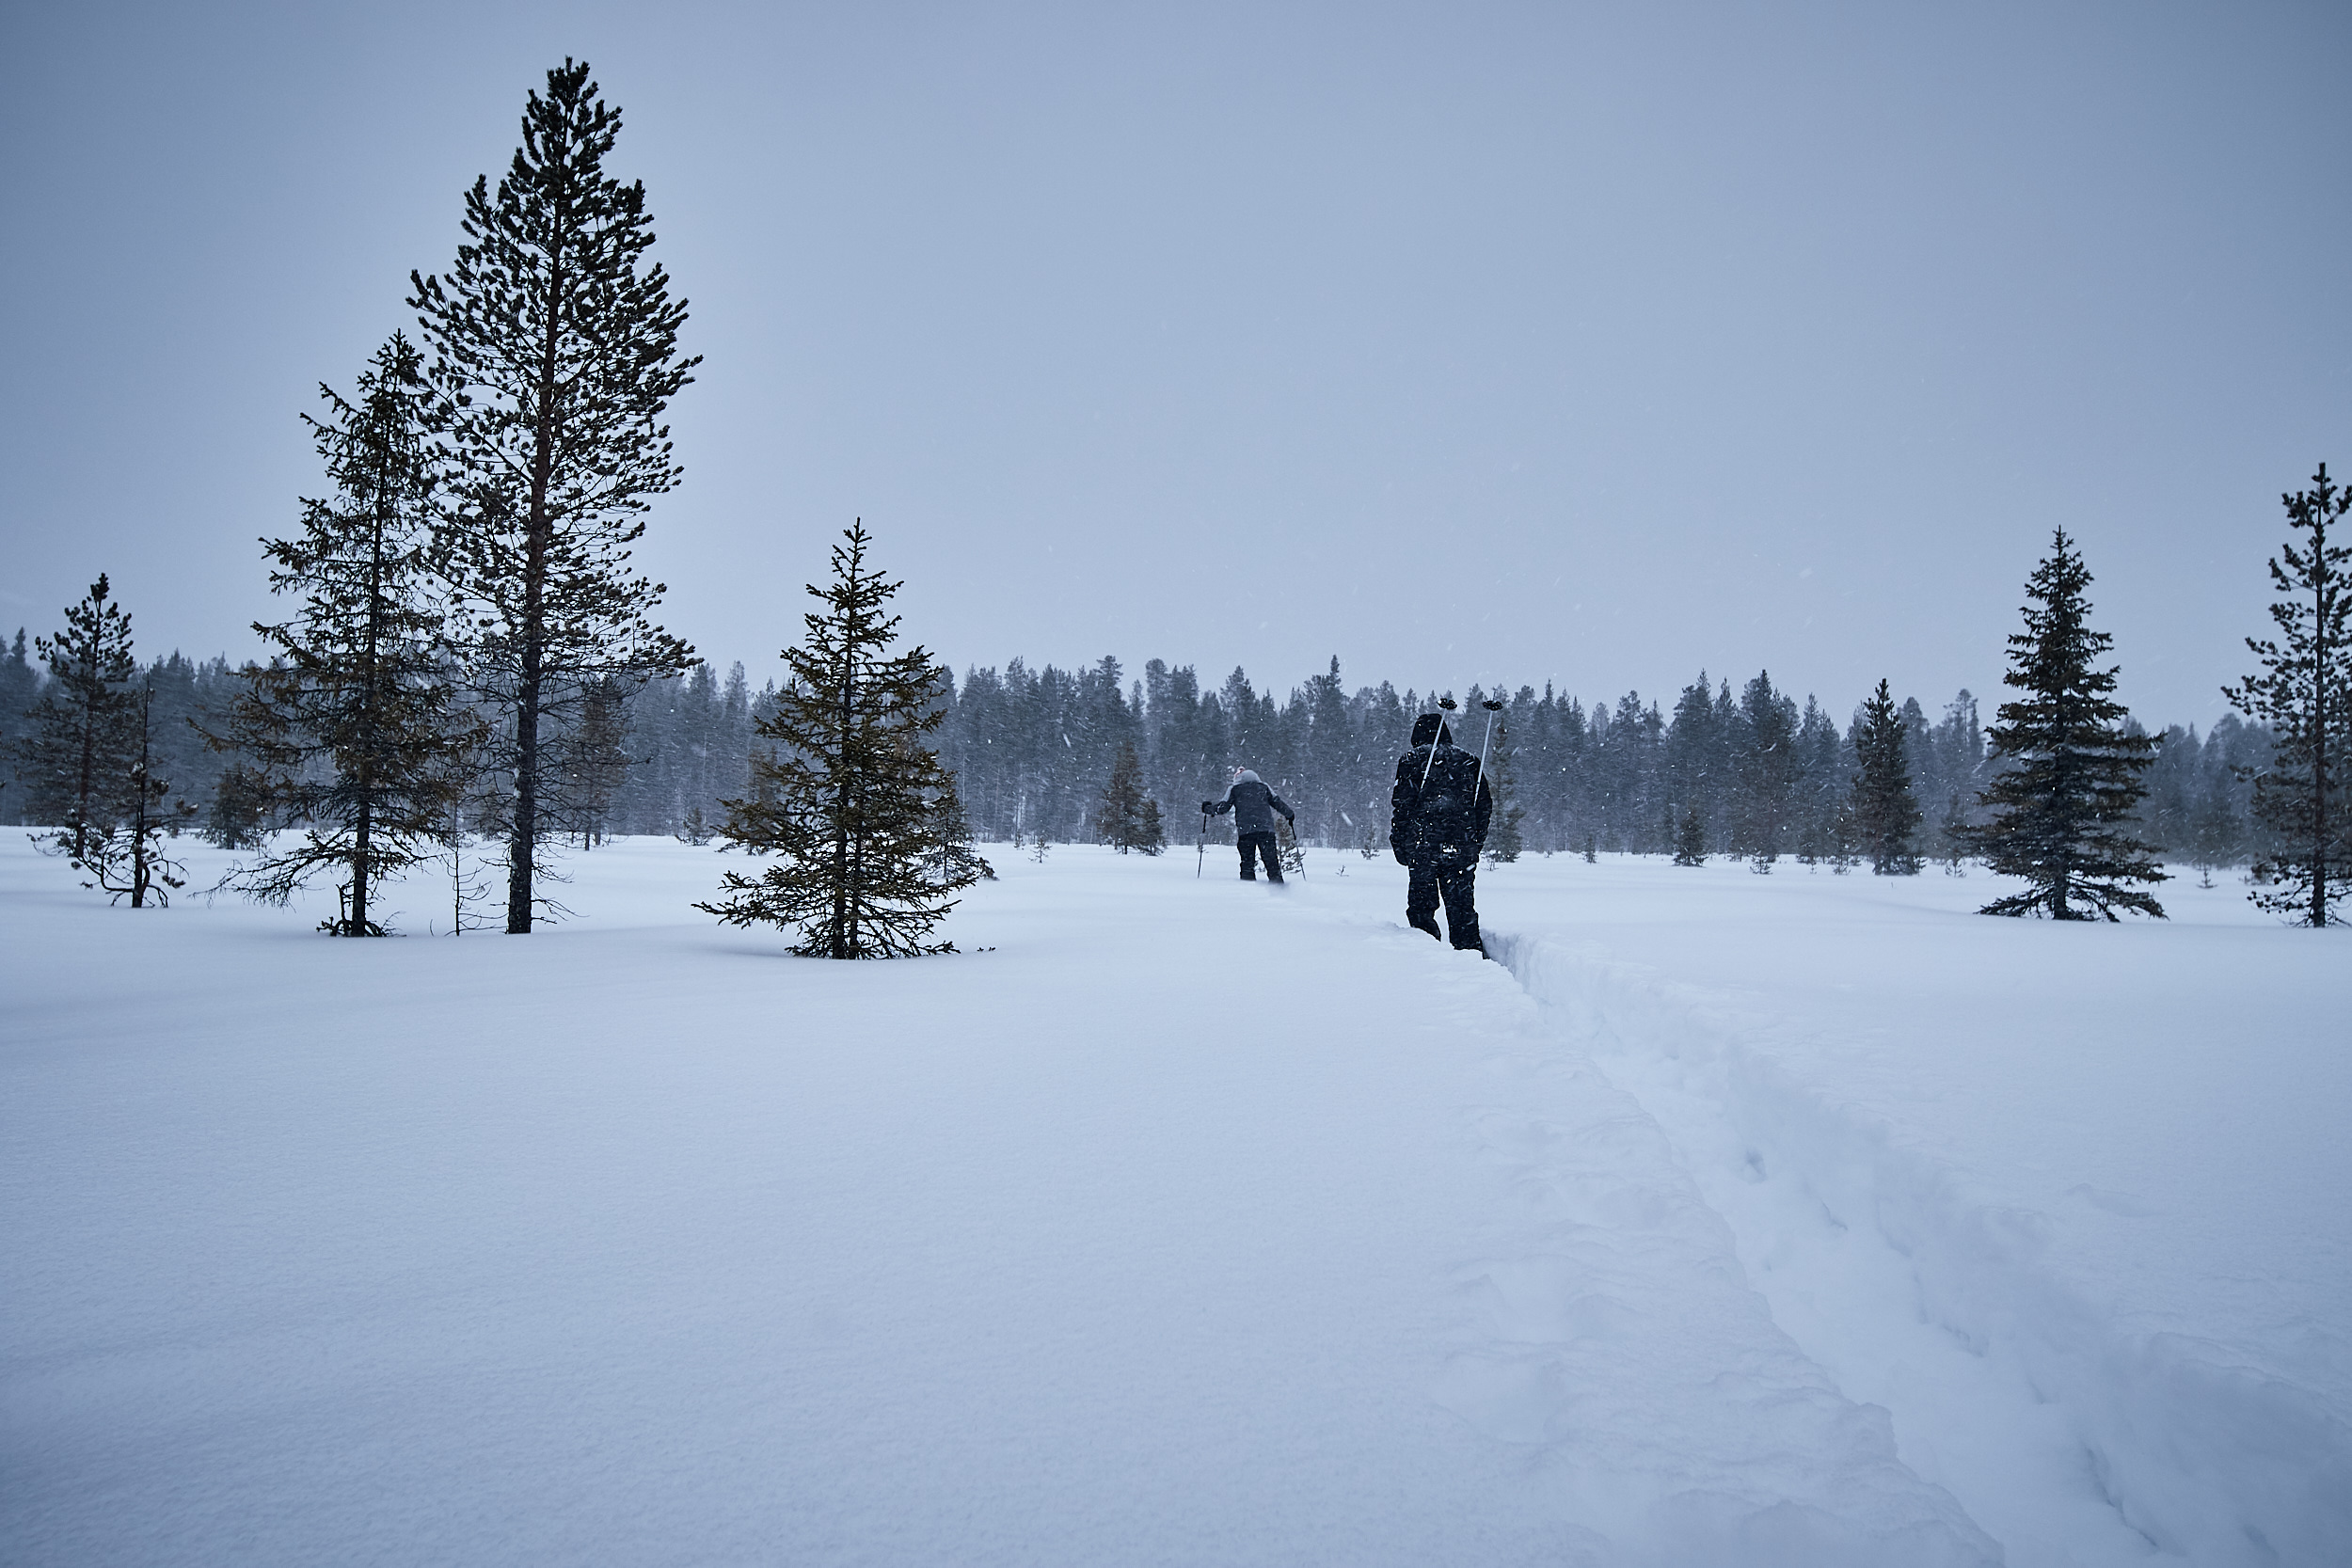 15 mm - 2019-03-09 16.58.21 - Oulu Marvin Timo.jpg